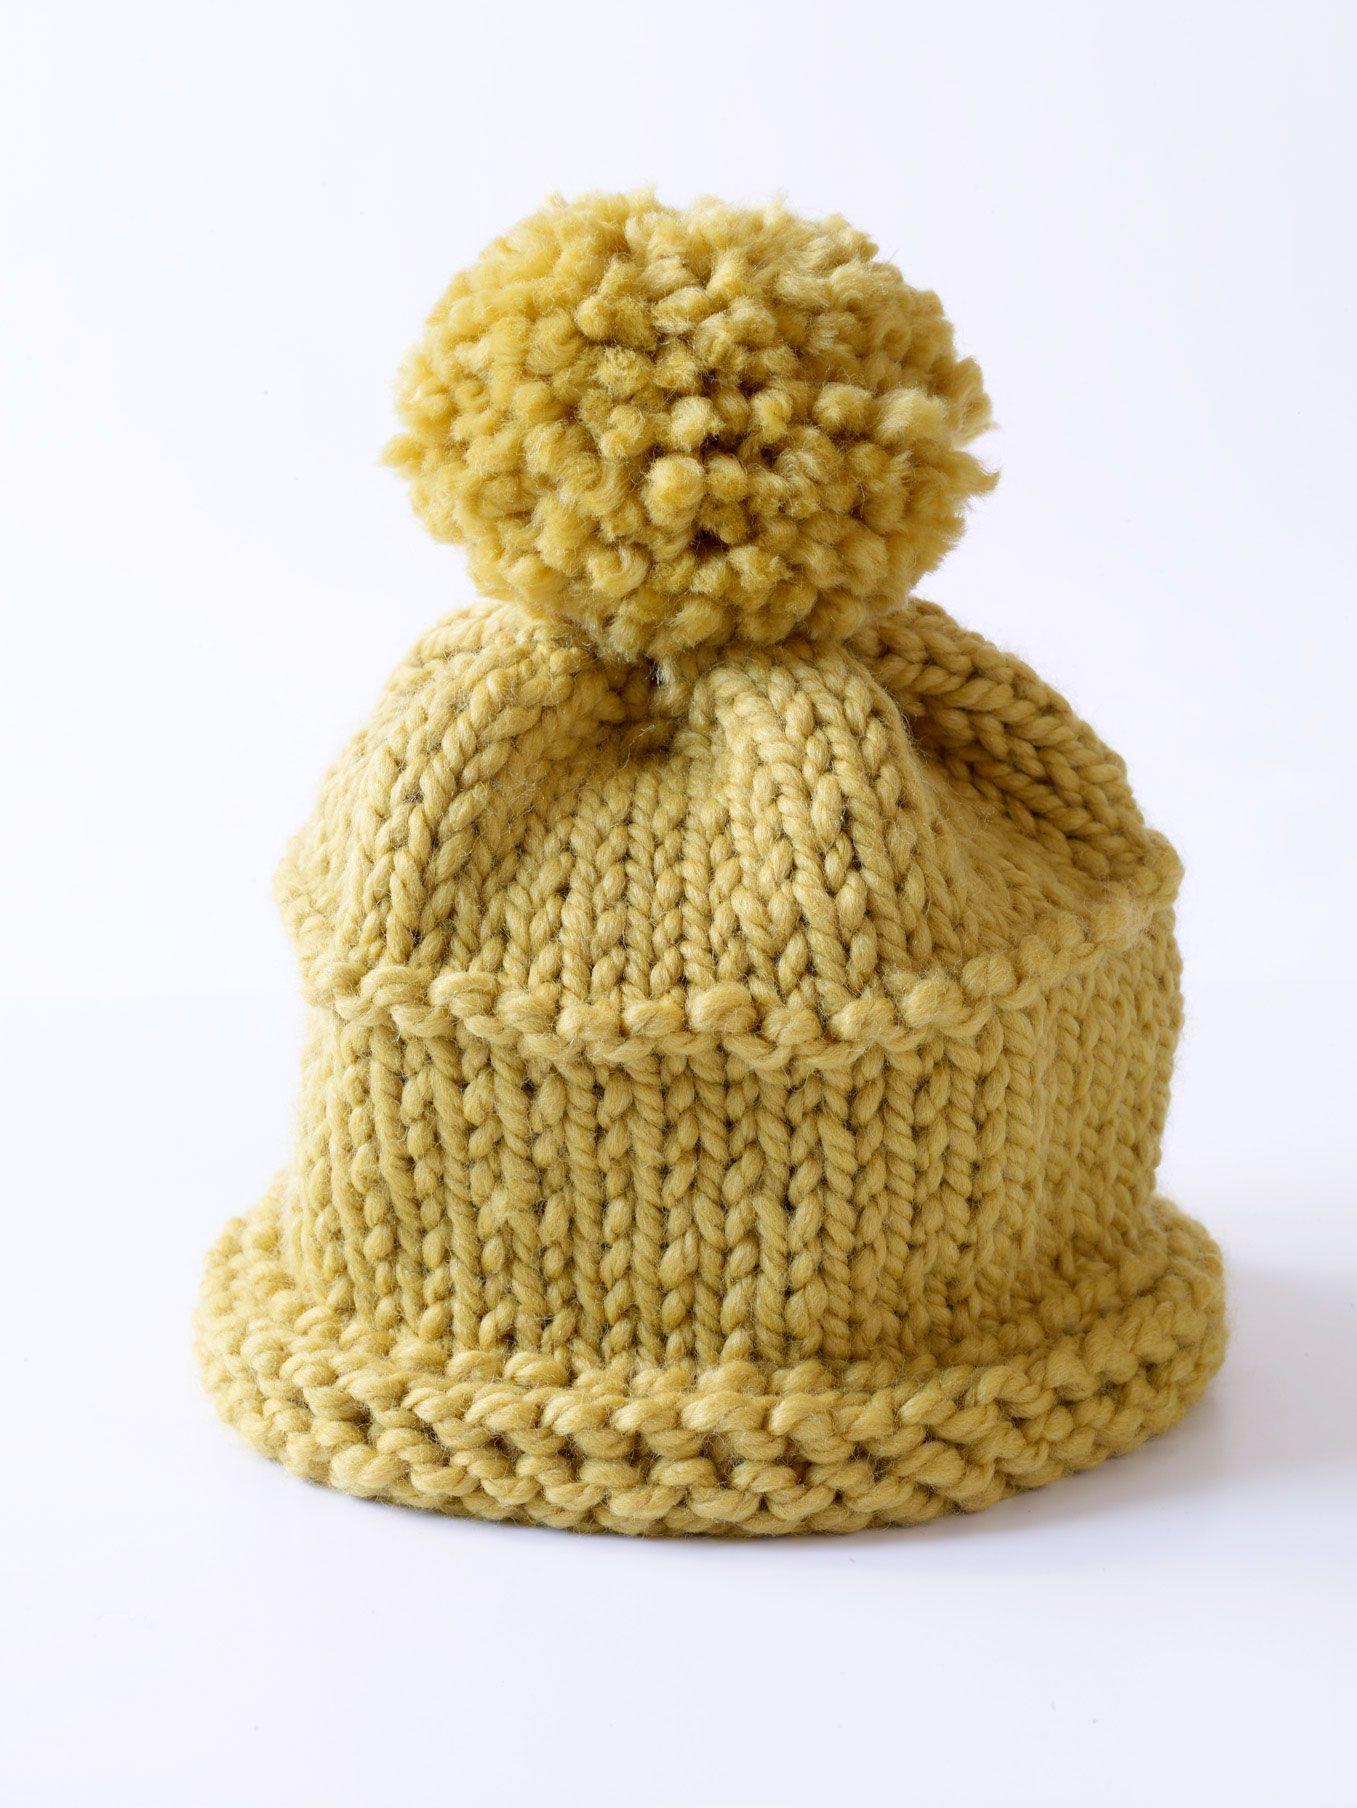 knitting patterns for hats | Free Knitting Pattern 70436AD Knit Hat ...